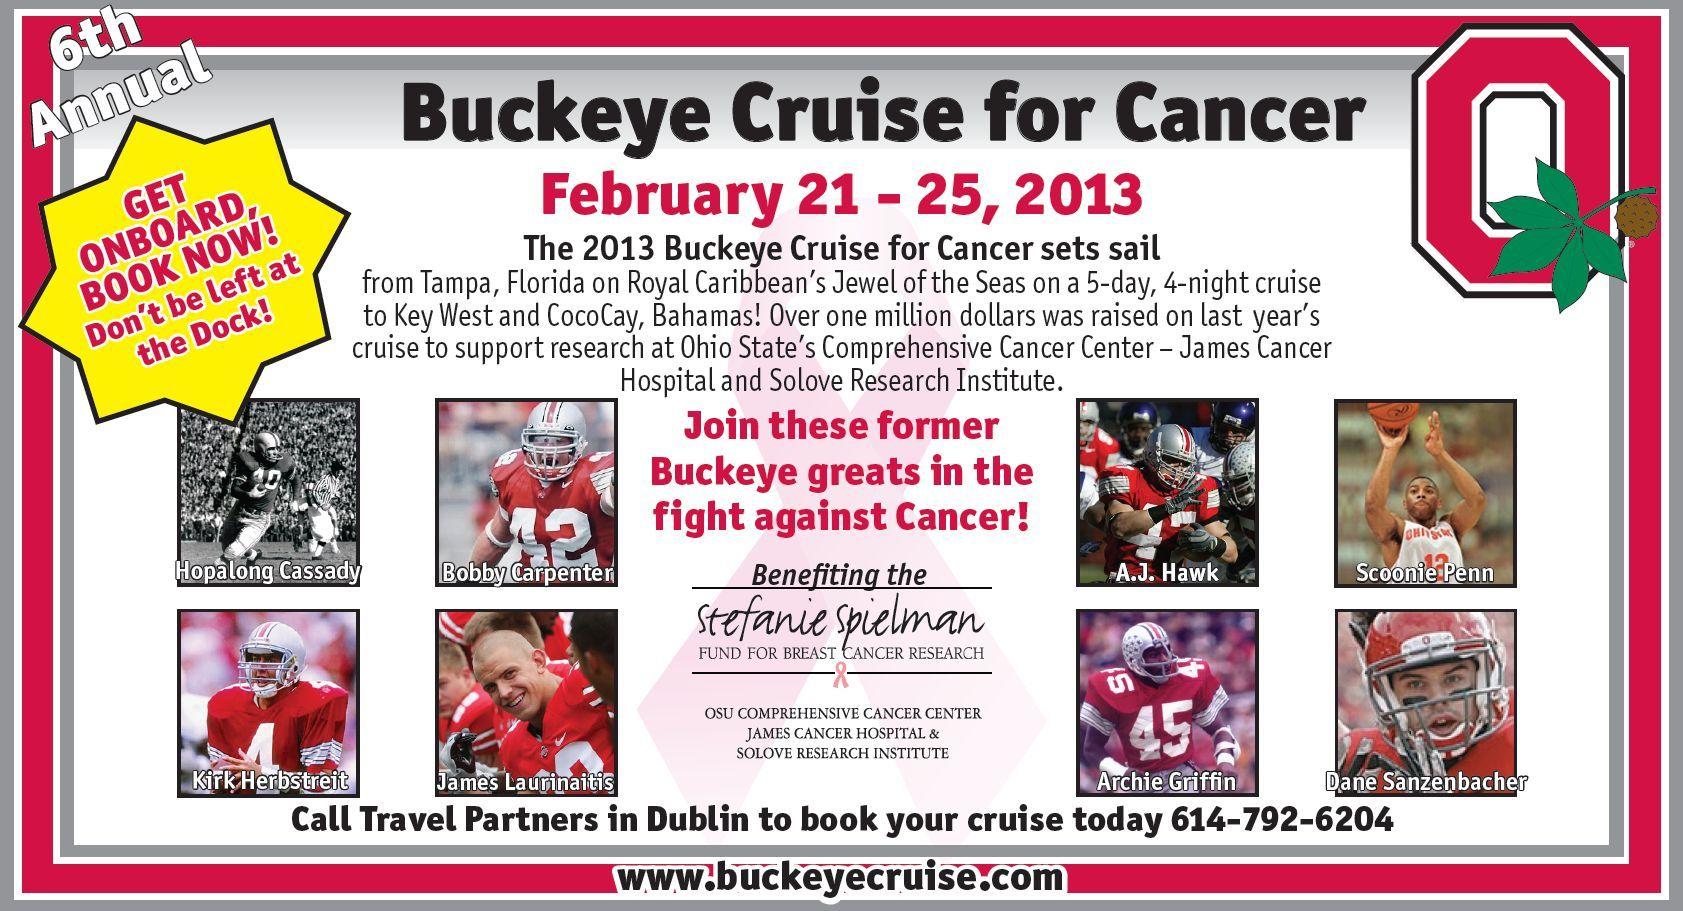 Buckeye Cruise for Cancer - 2013